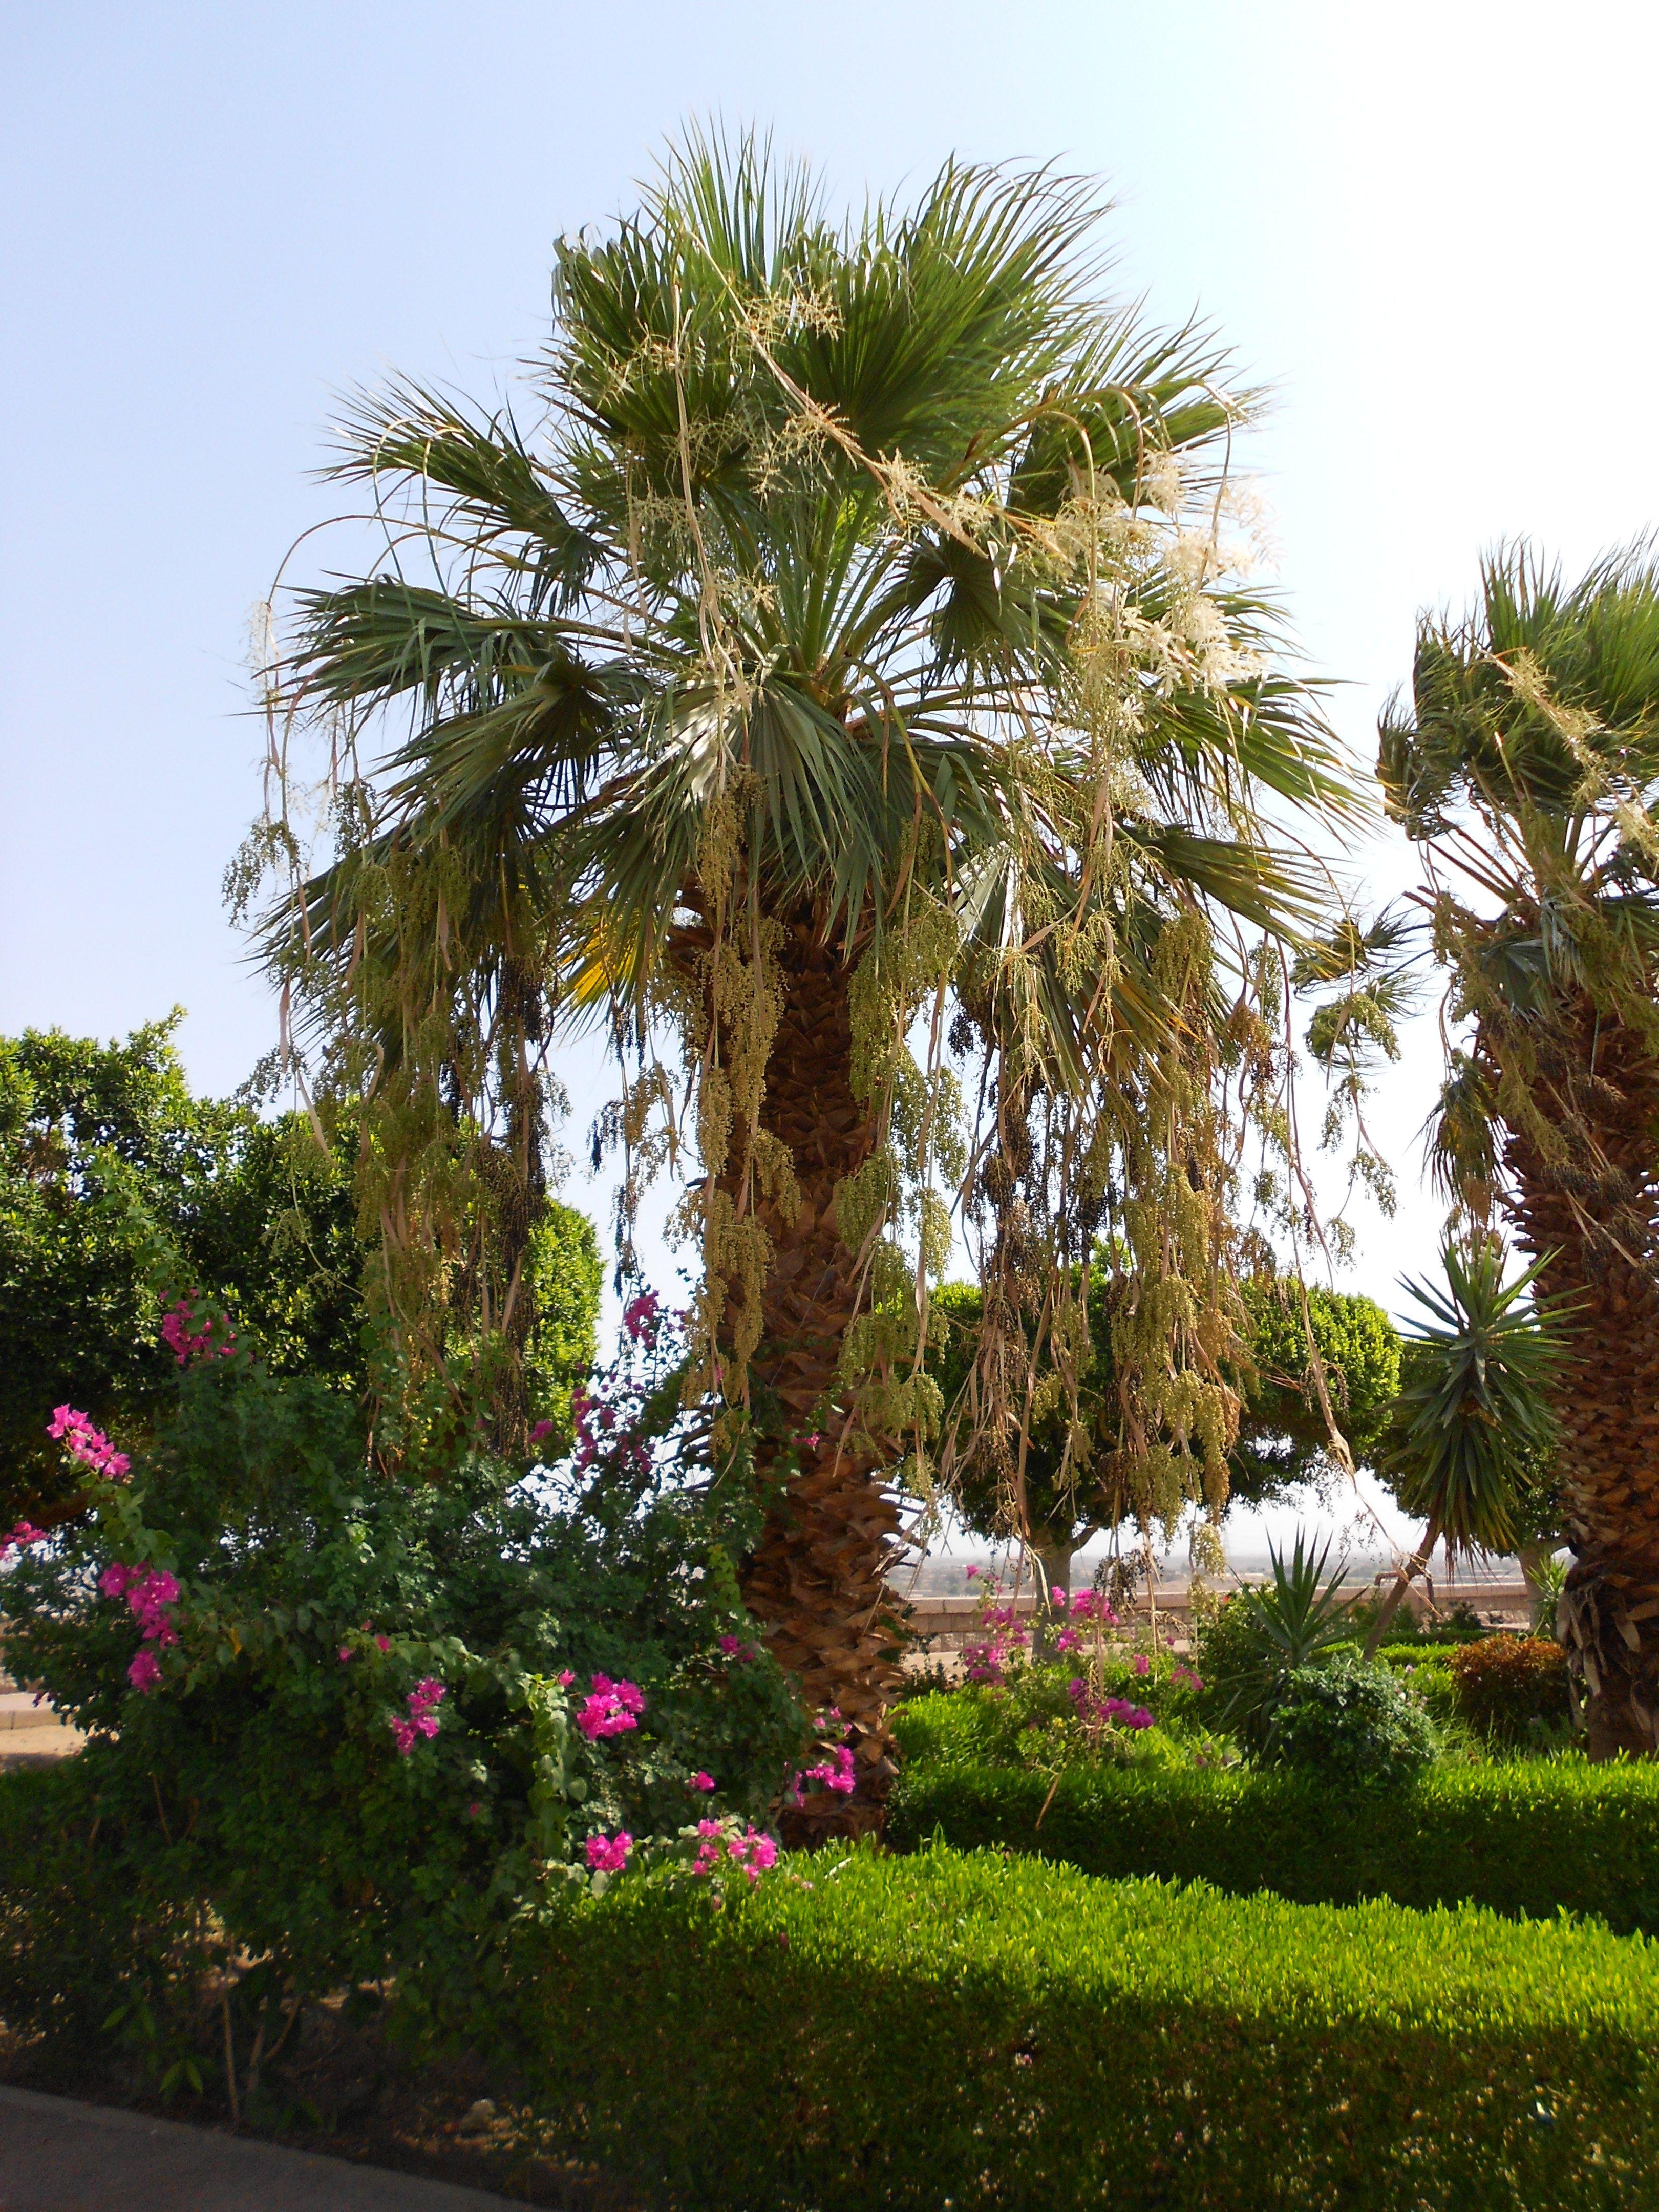 Garden - Aswan High Dam | Africa, Dubai, Egypt, Red Sea, Saudi ...